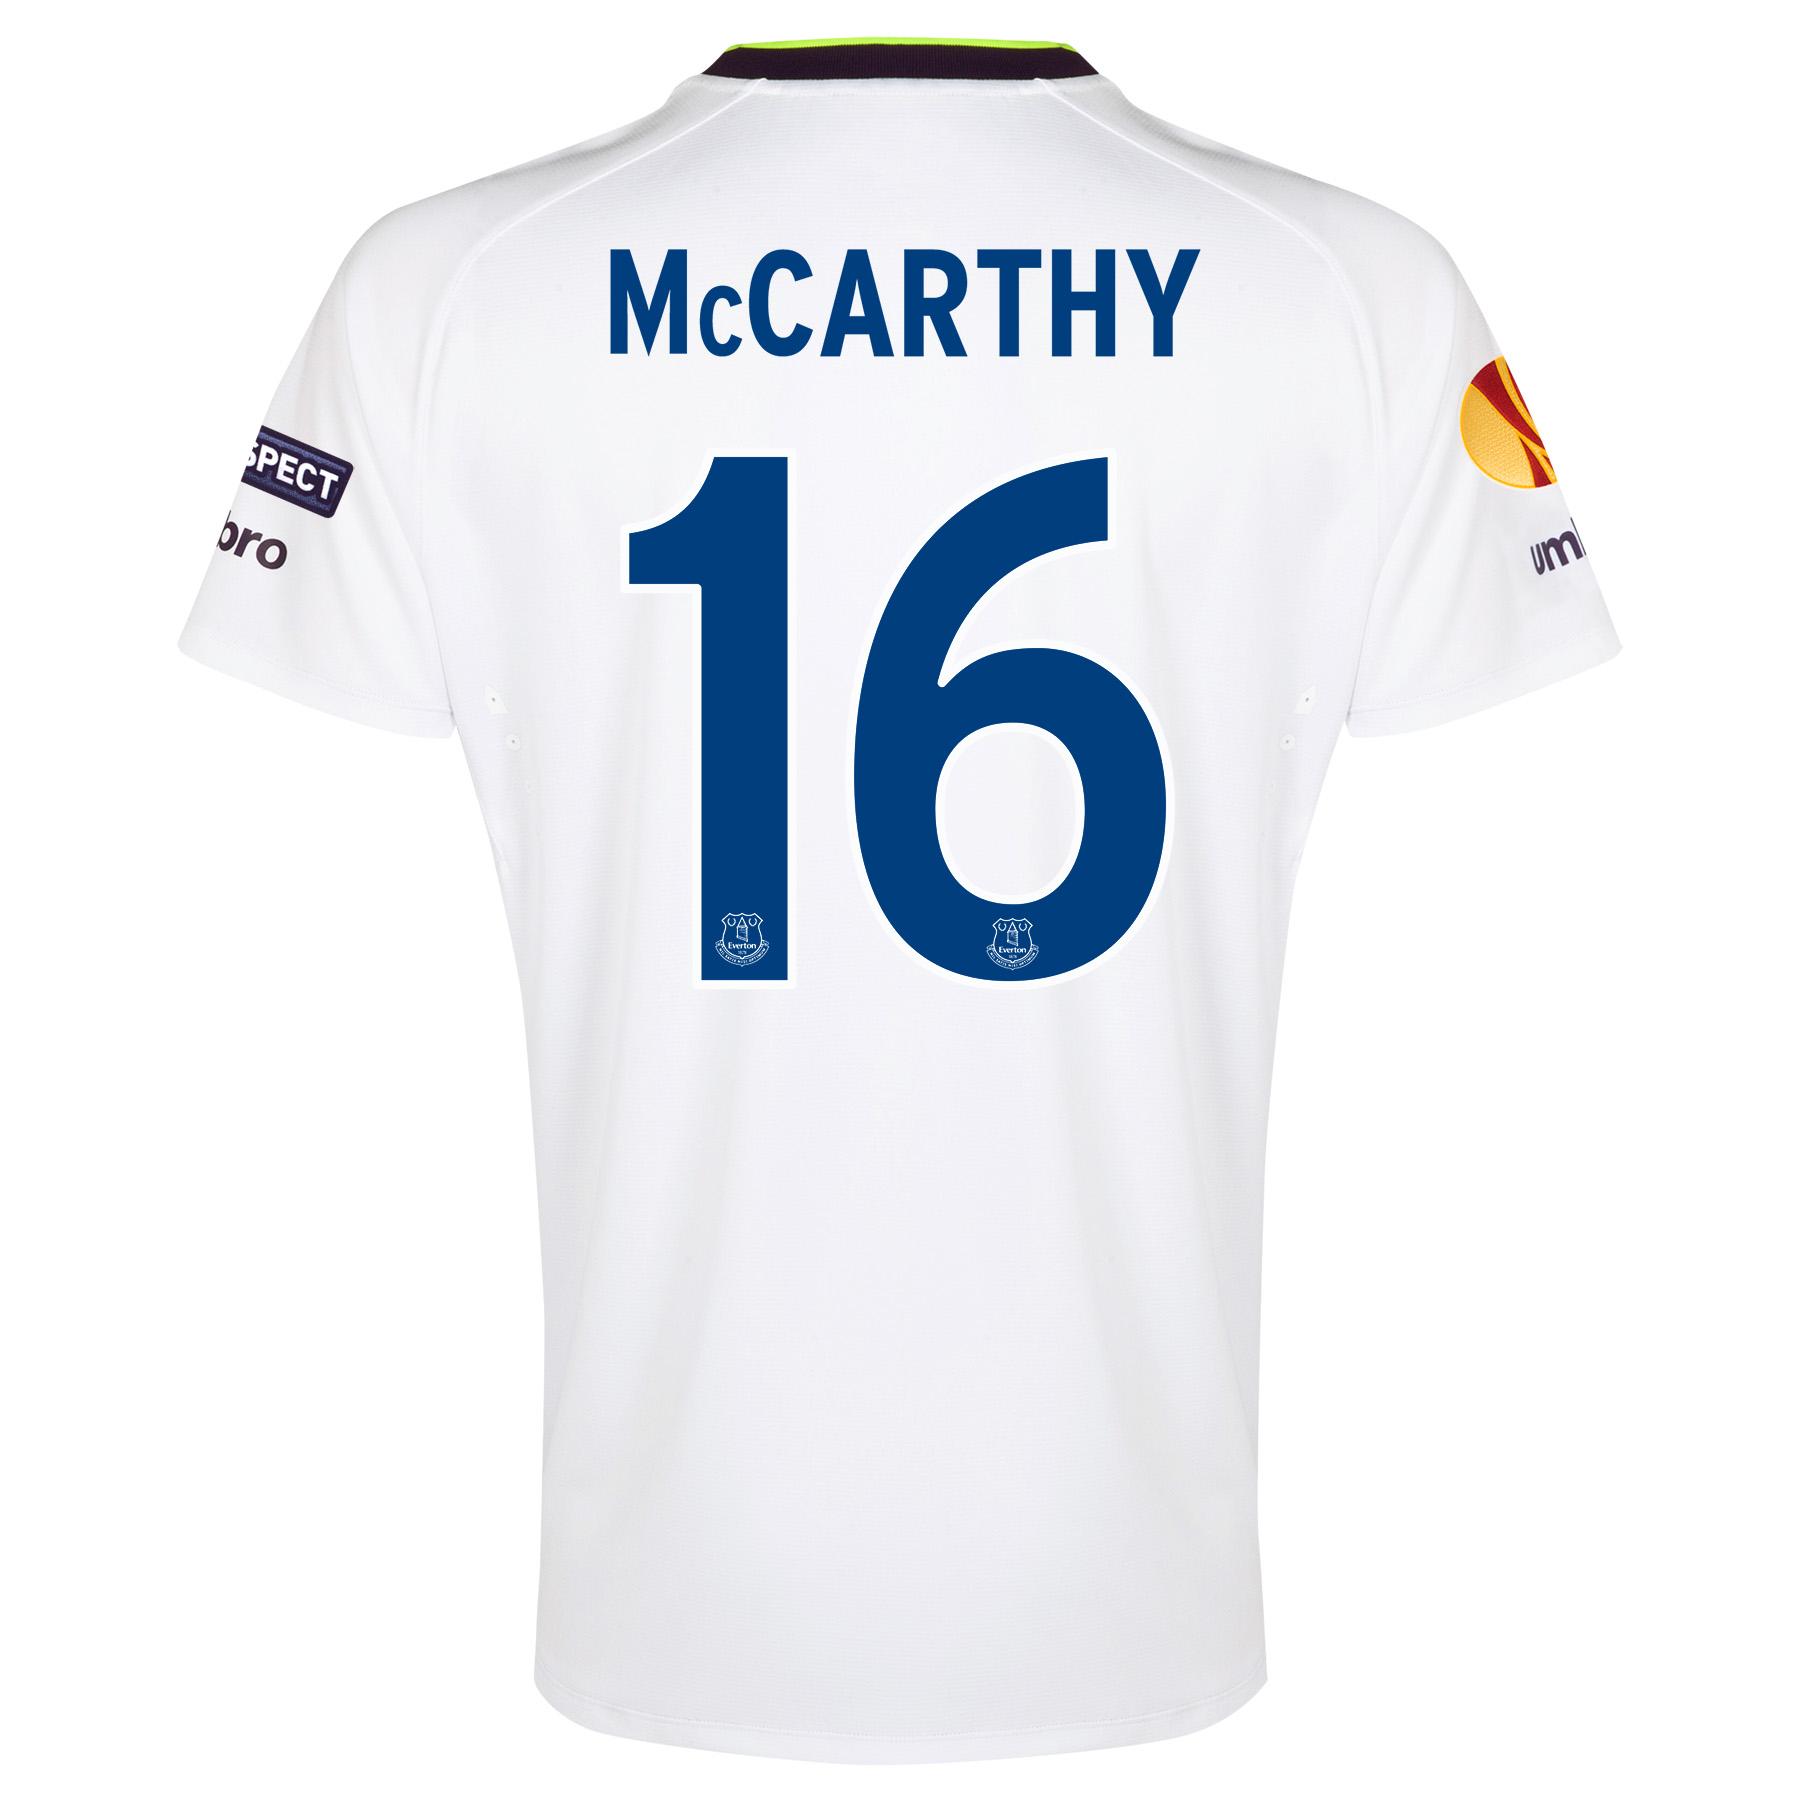 Everton UEFA Europa League 3rd Shirt 2014/15 with McCarthy 16 printing